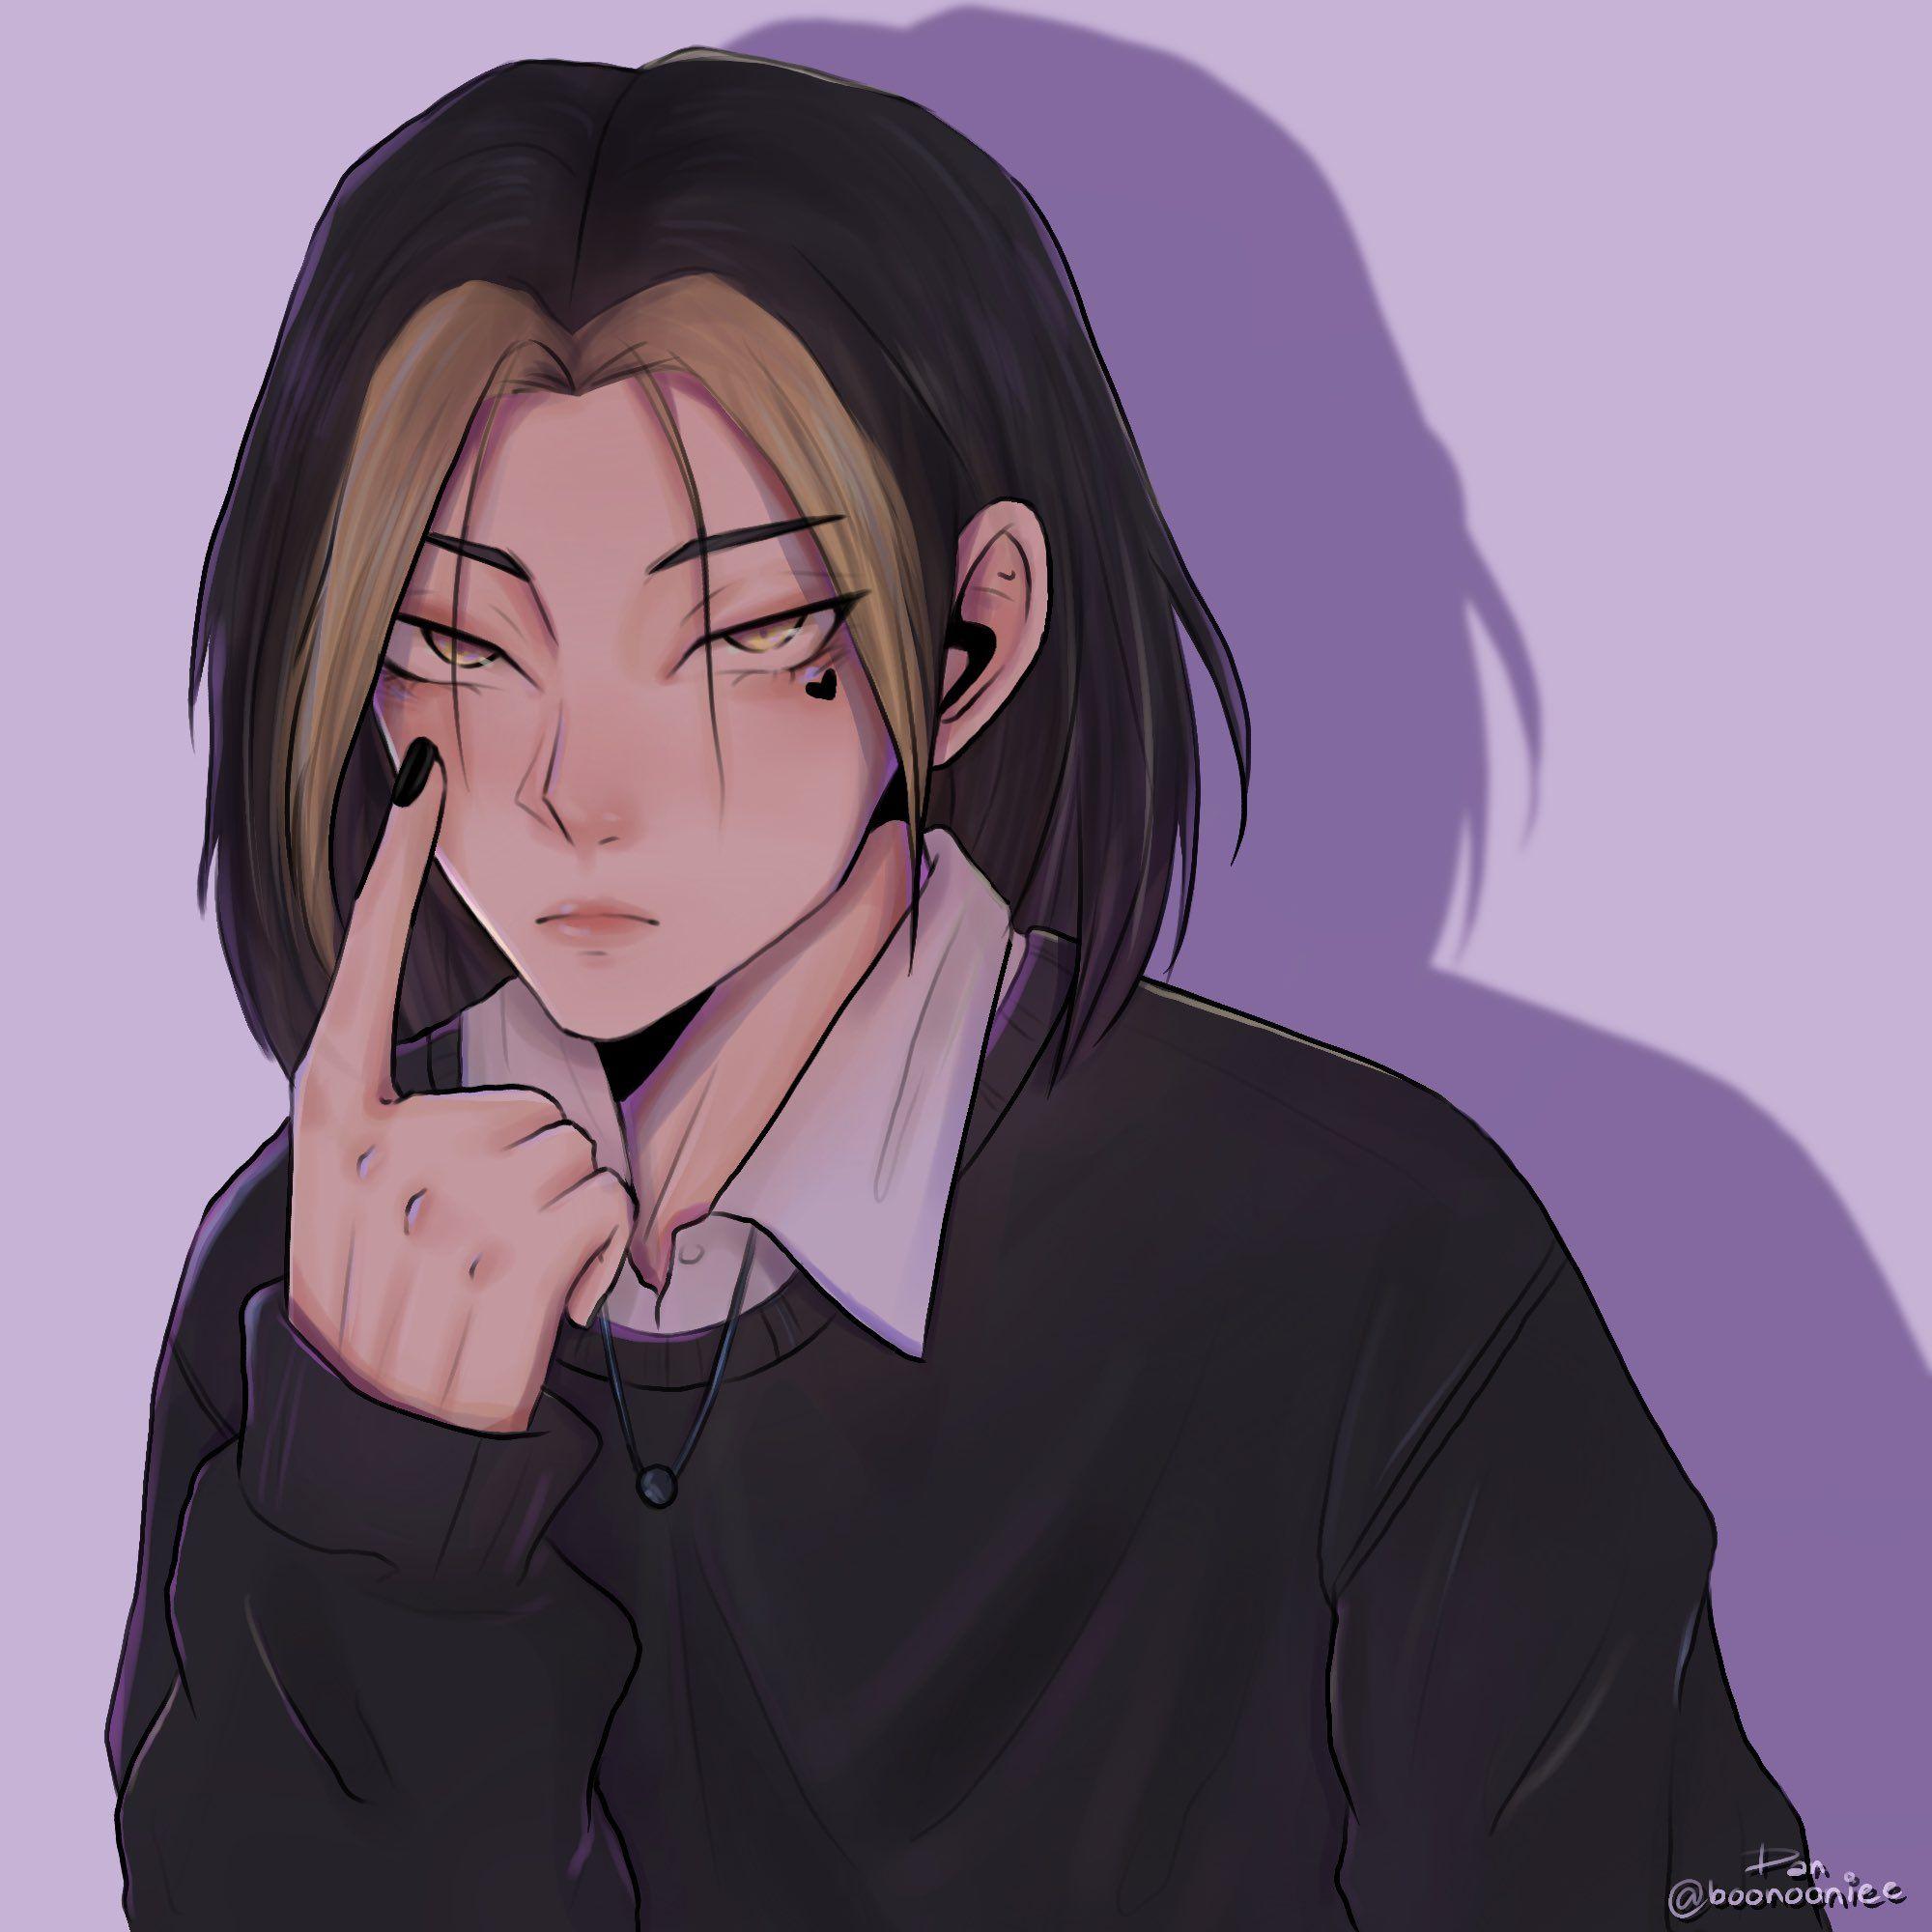 Photo of ༘boonooniee˚* ❀ on Twitter